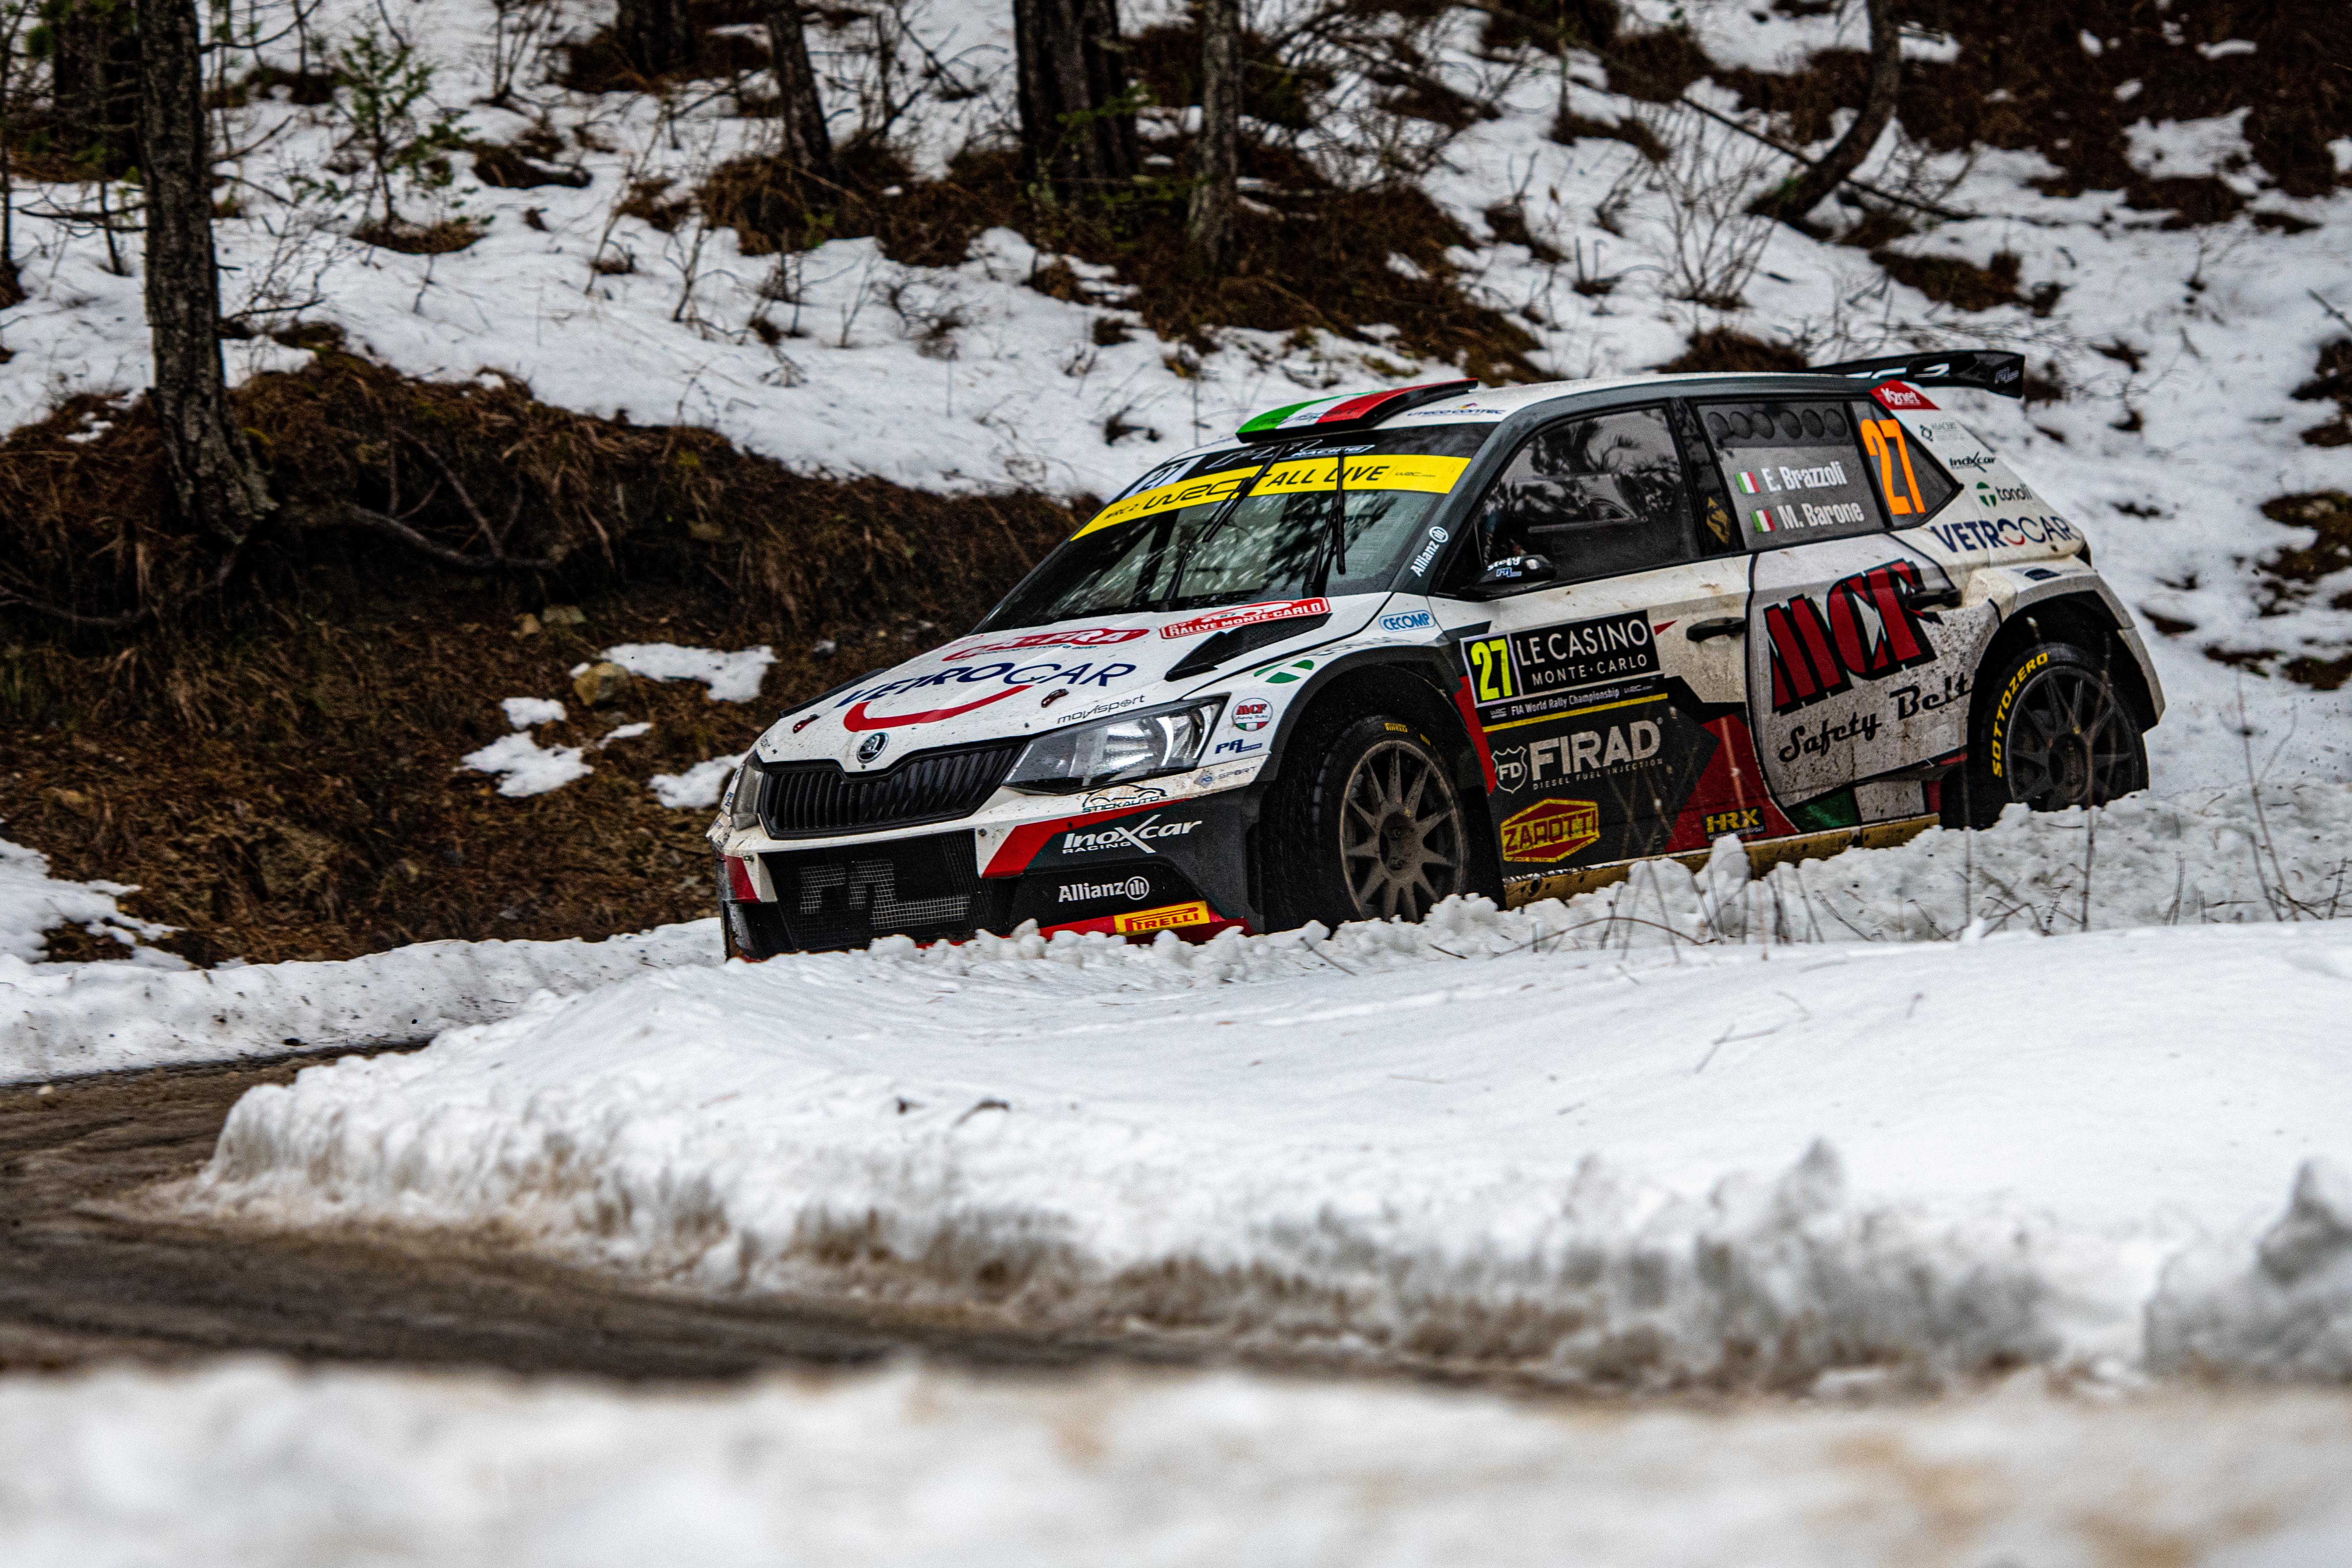 Rallye Monte-Carlo: SKODA FABIA Rally2 evo driver Mikkelsen starts as WRC2 leader into last leg - Image 6